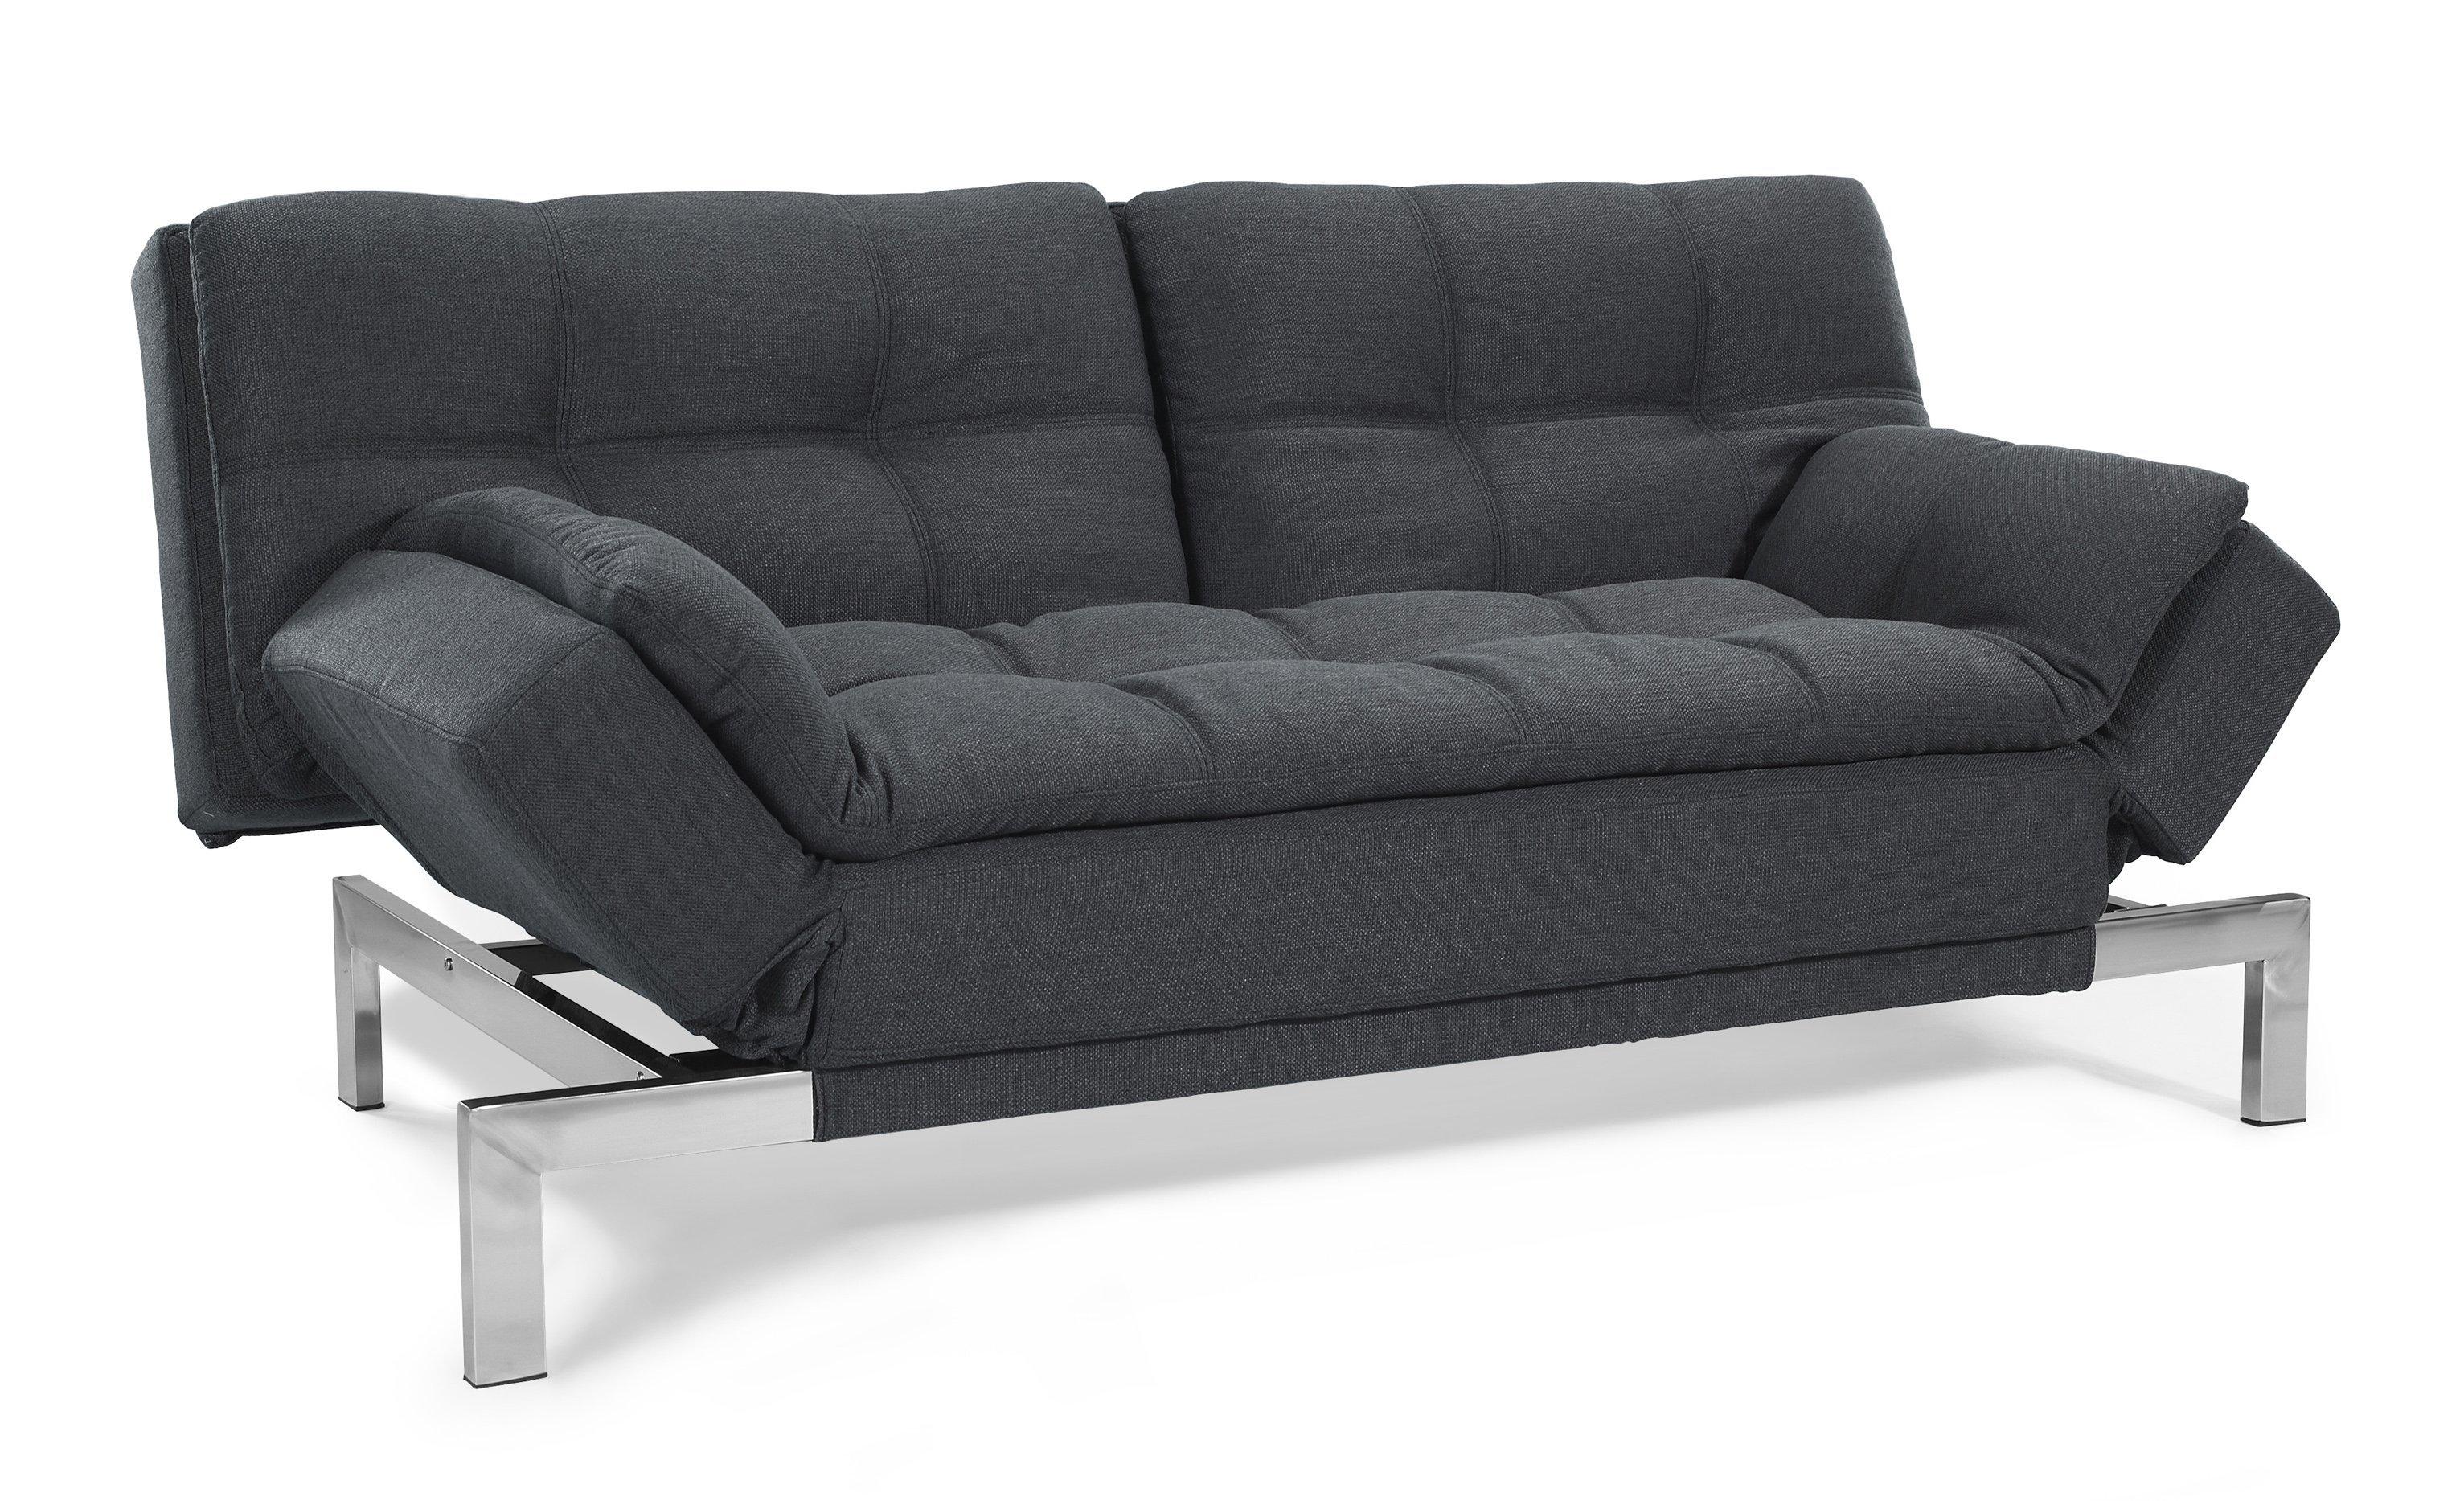 newport sofa convertible bed simmons beautyrest reviews serta home furniture design